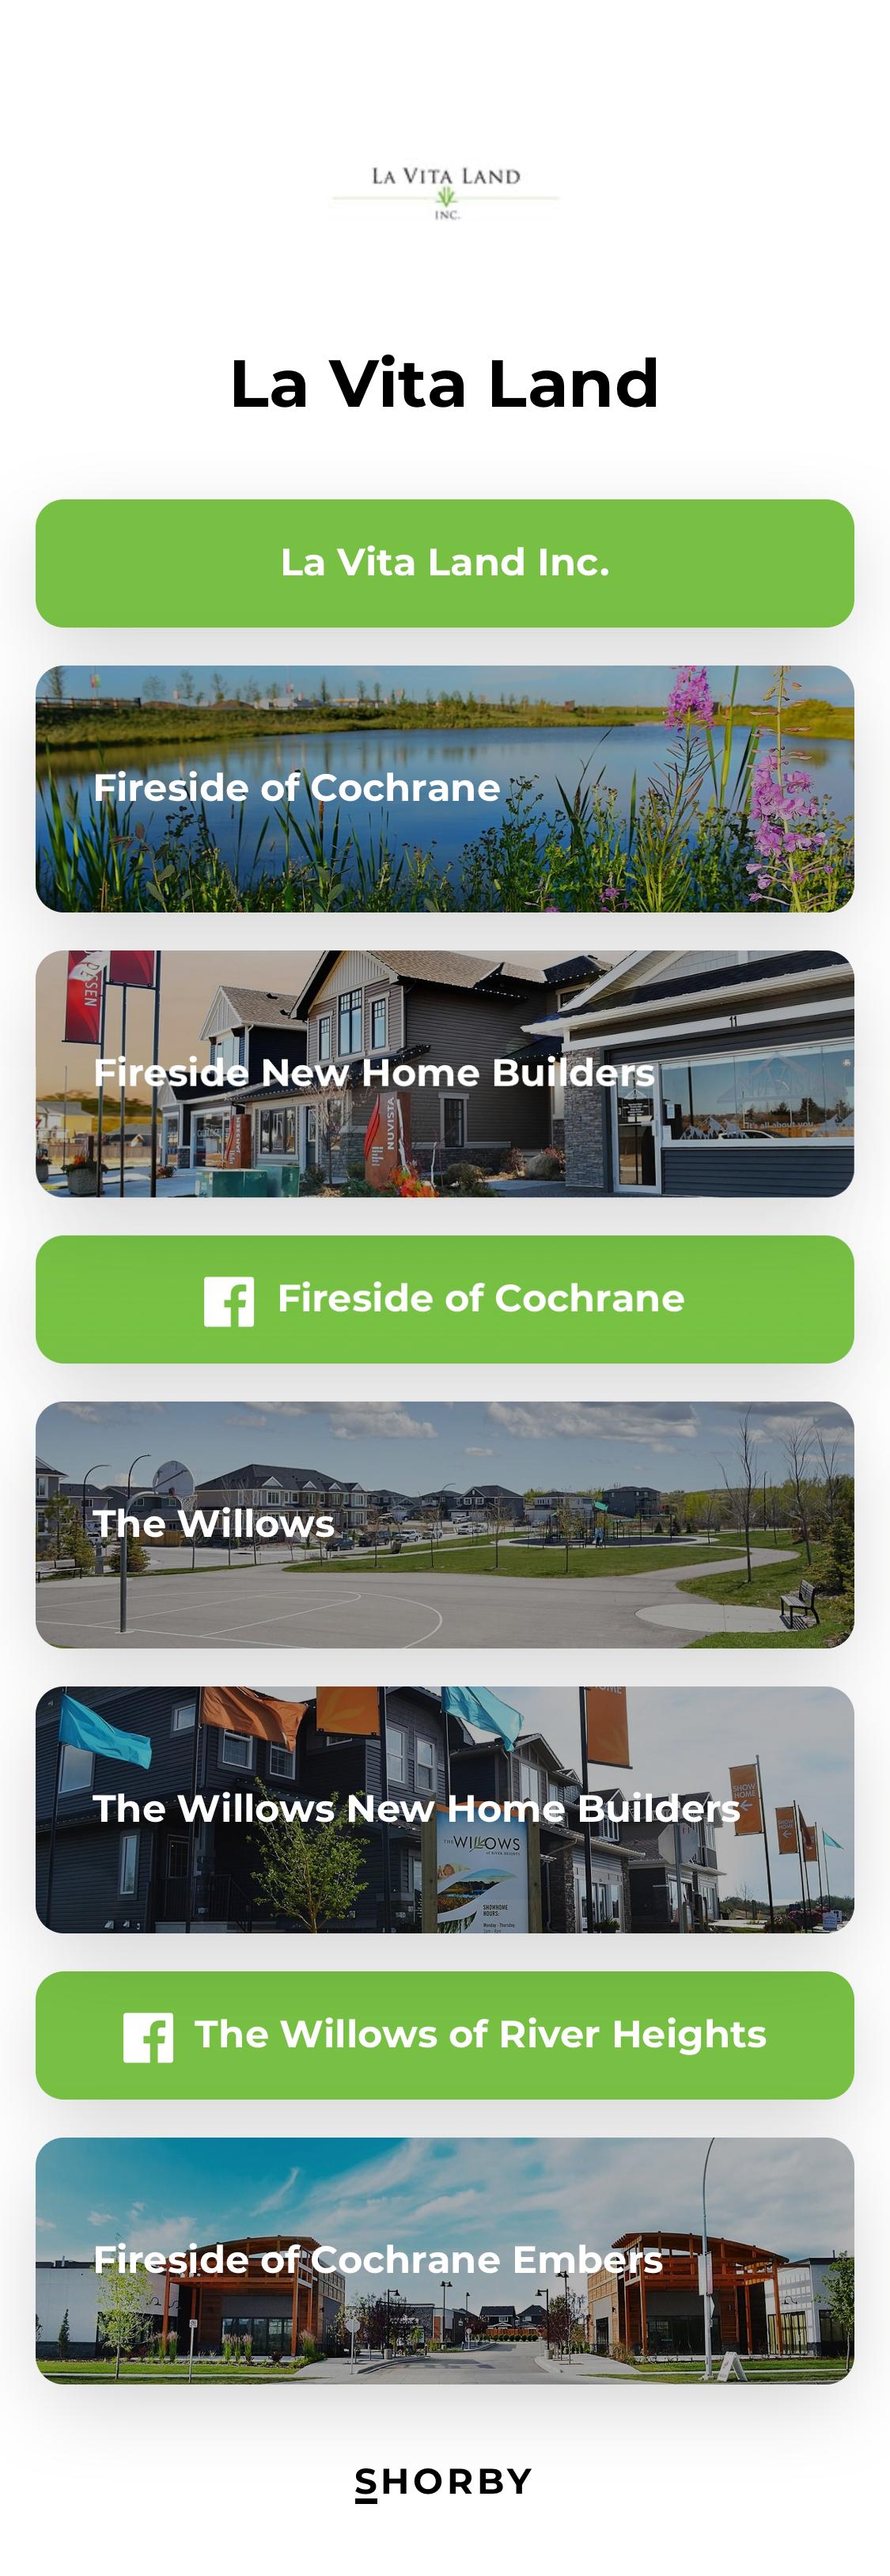 La Vita Land Smart Bio Links Ideas And Example For Realtors Real Estate Insurance Sales Agent Social Media Traffic Realtors Sales Agent